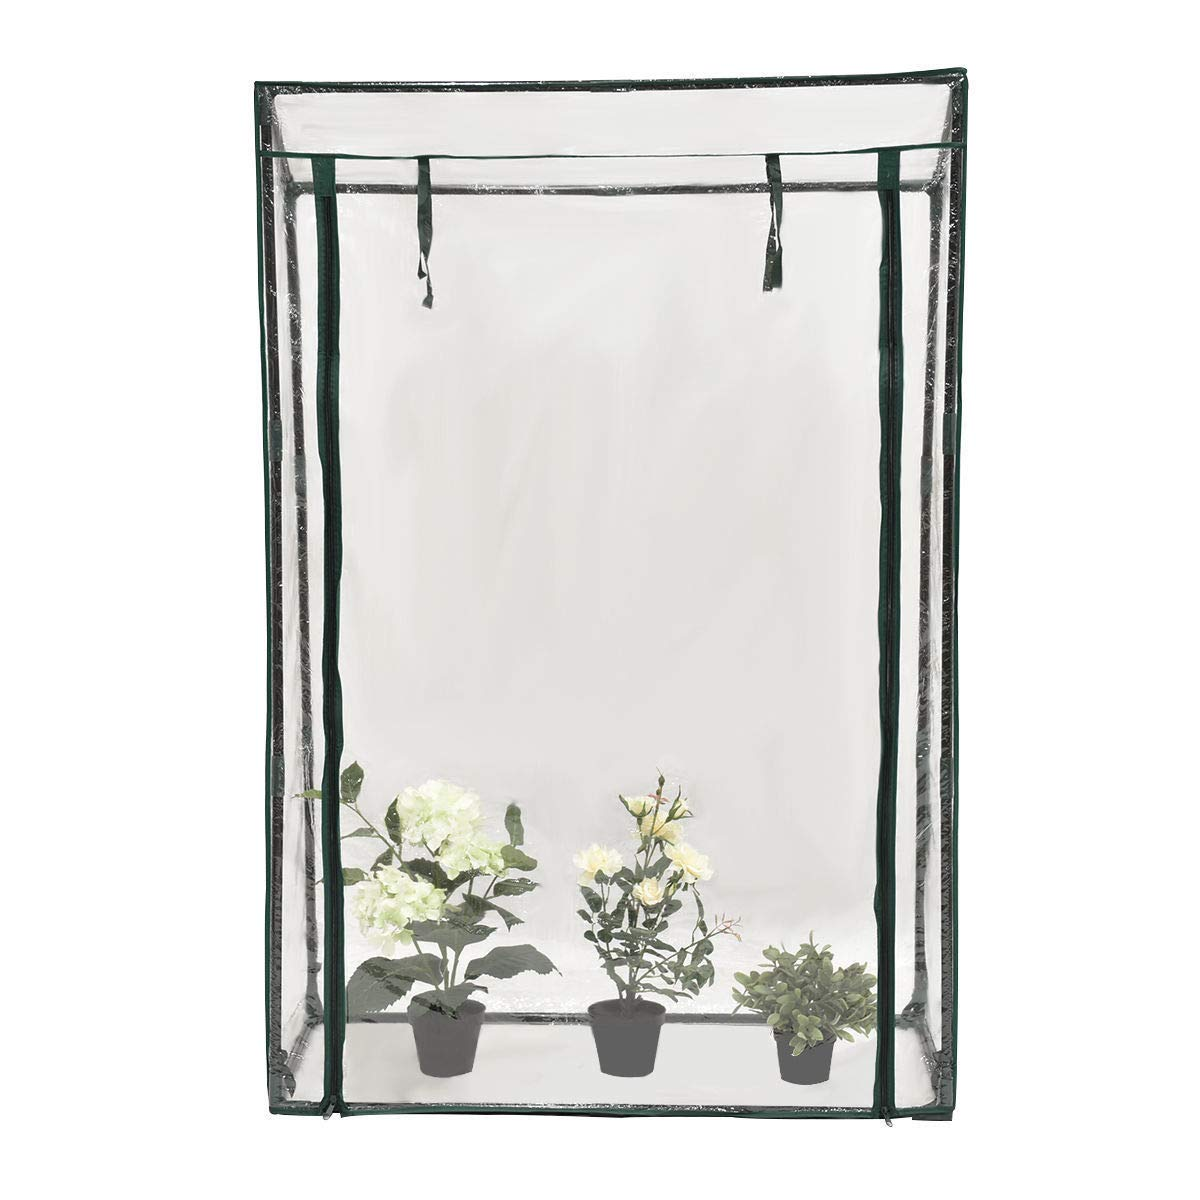 eyesonme Garden Greenhouse Grow House Plant Vegetable Grow Bag W/PVC Cover 40''x20''x59''